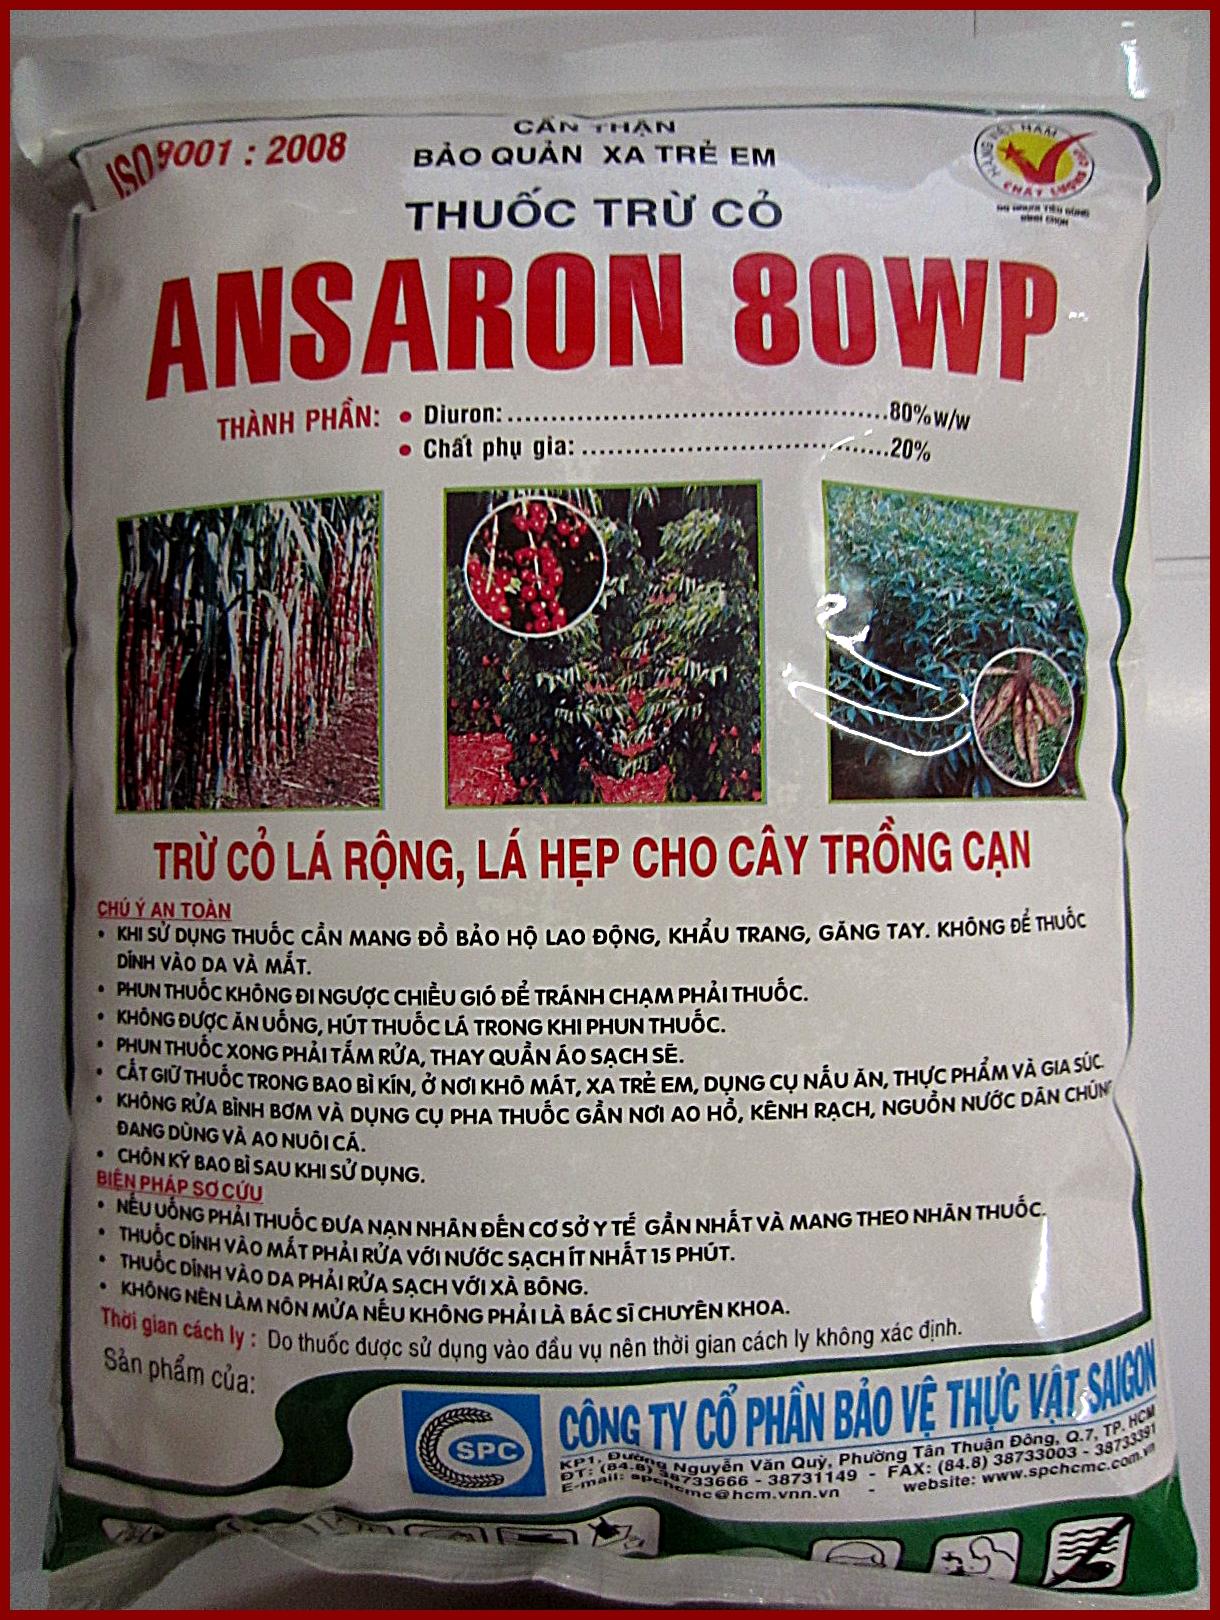 ANSARON 80WP